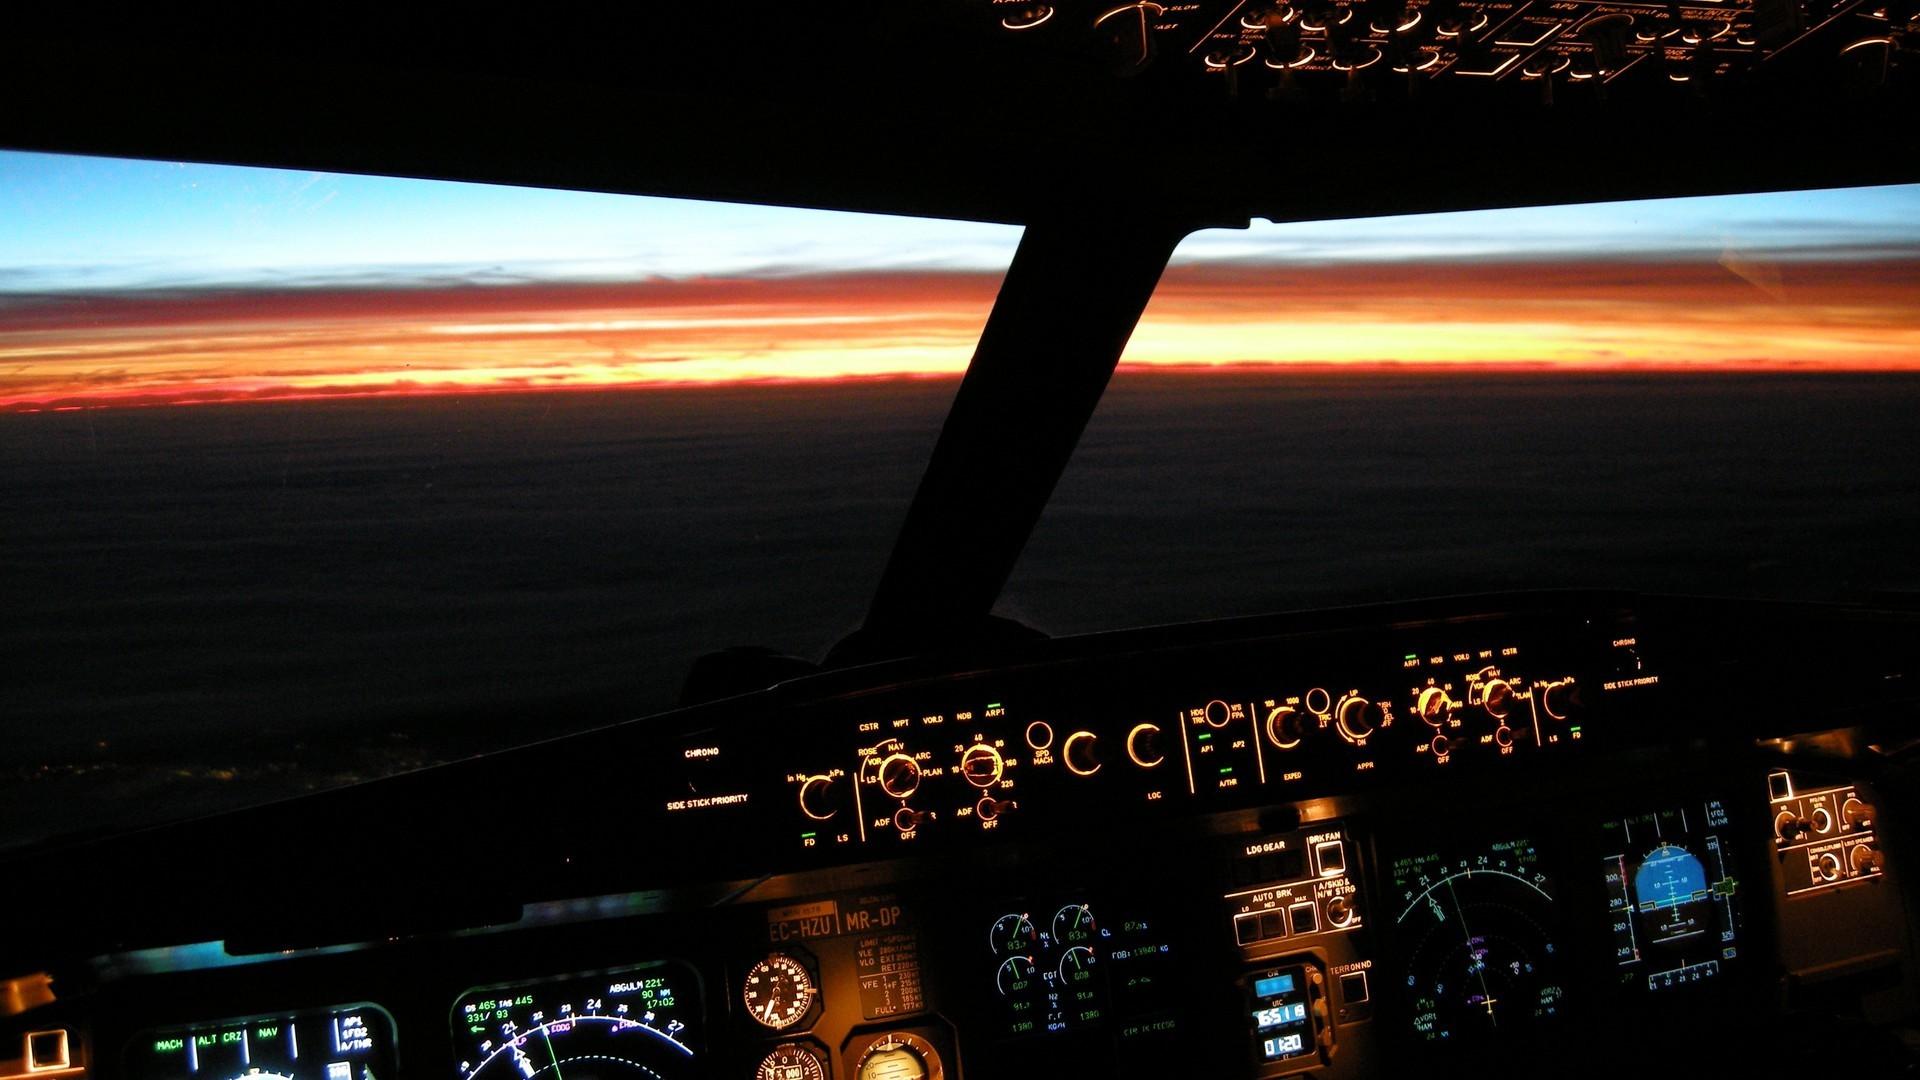 Airbus-Cockpit beleuchtet sunset wallpaper   AllWallpaper .